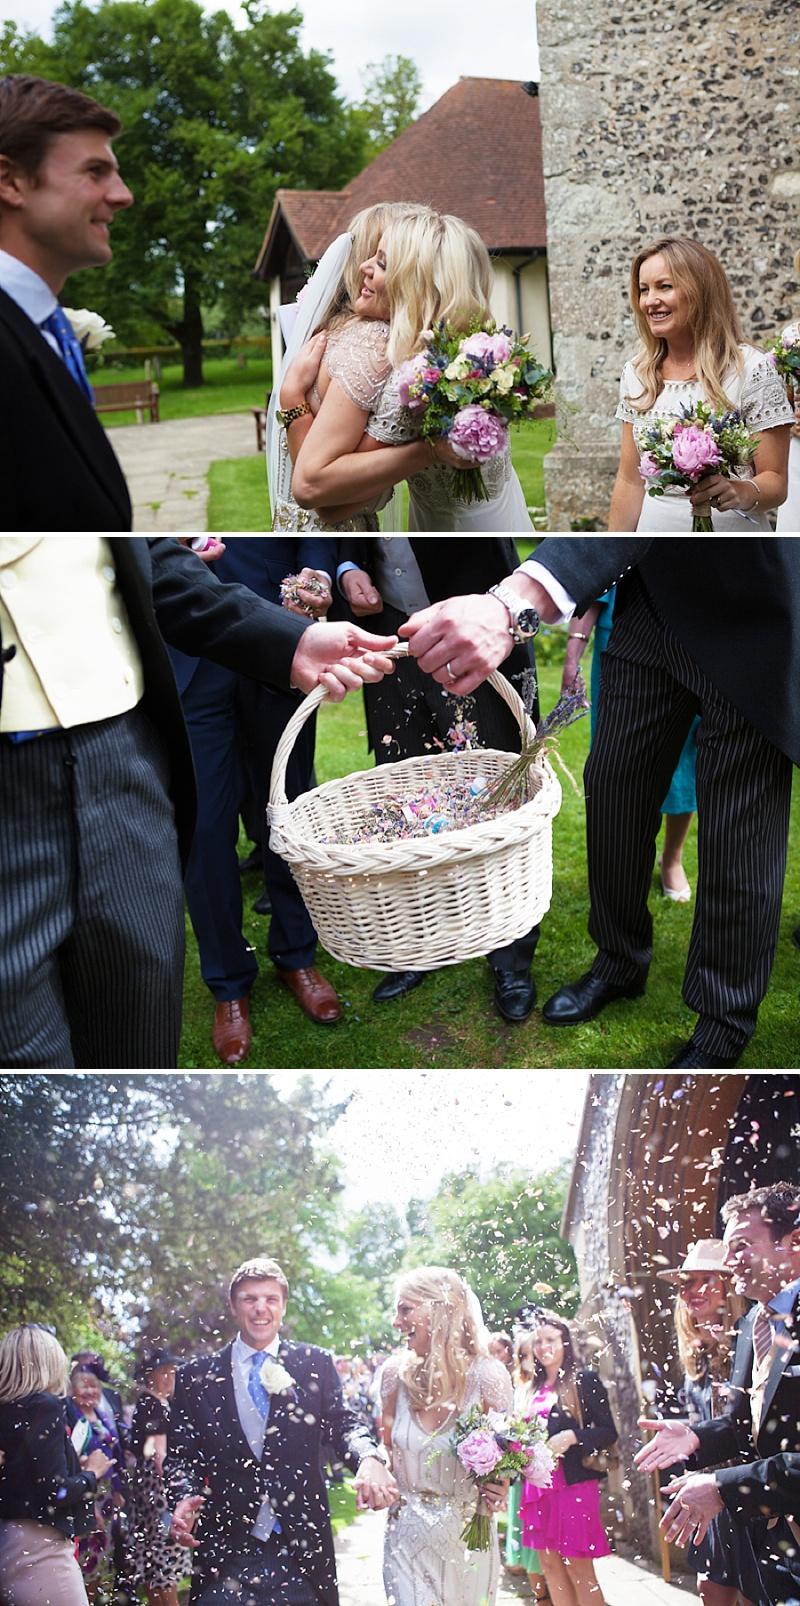 Summer Garden Party Wedding In Hertfordshire, Bride In Jenny Packham Eden Gown, Images by Annamarie Stepney_0009